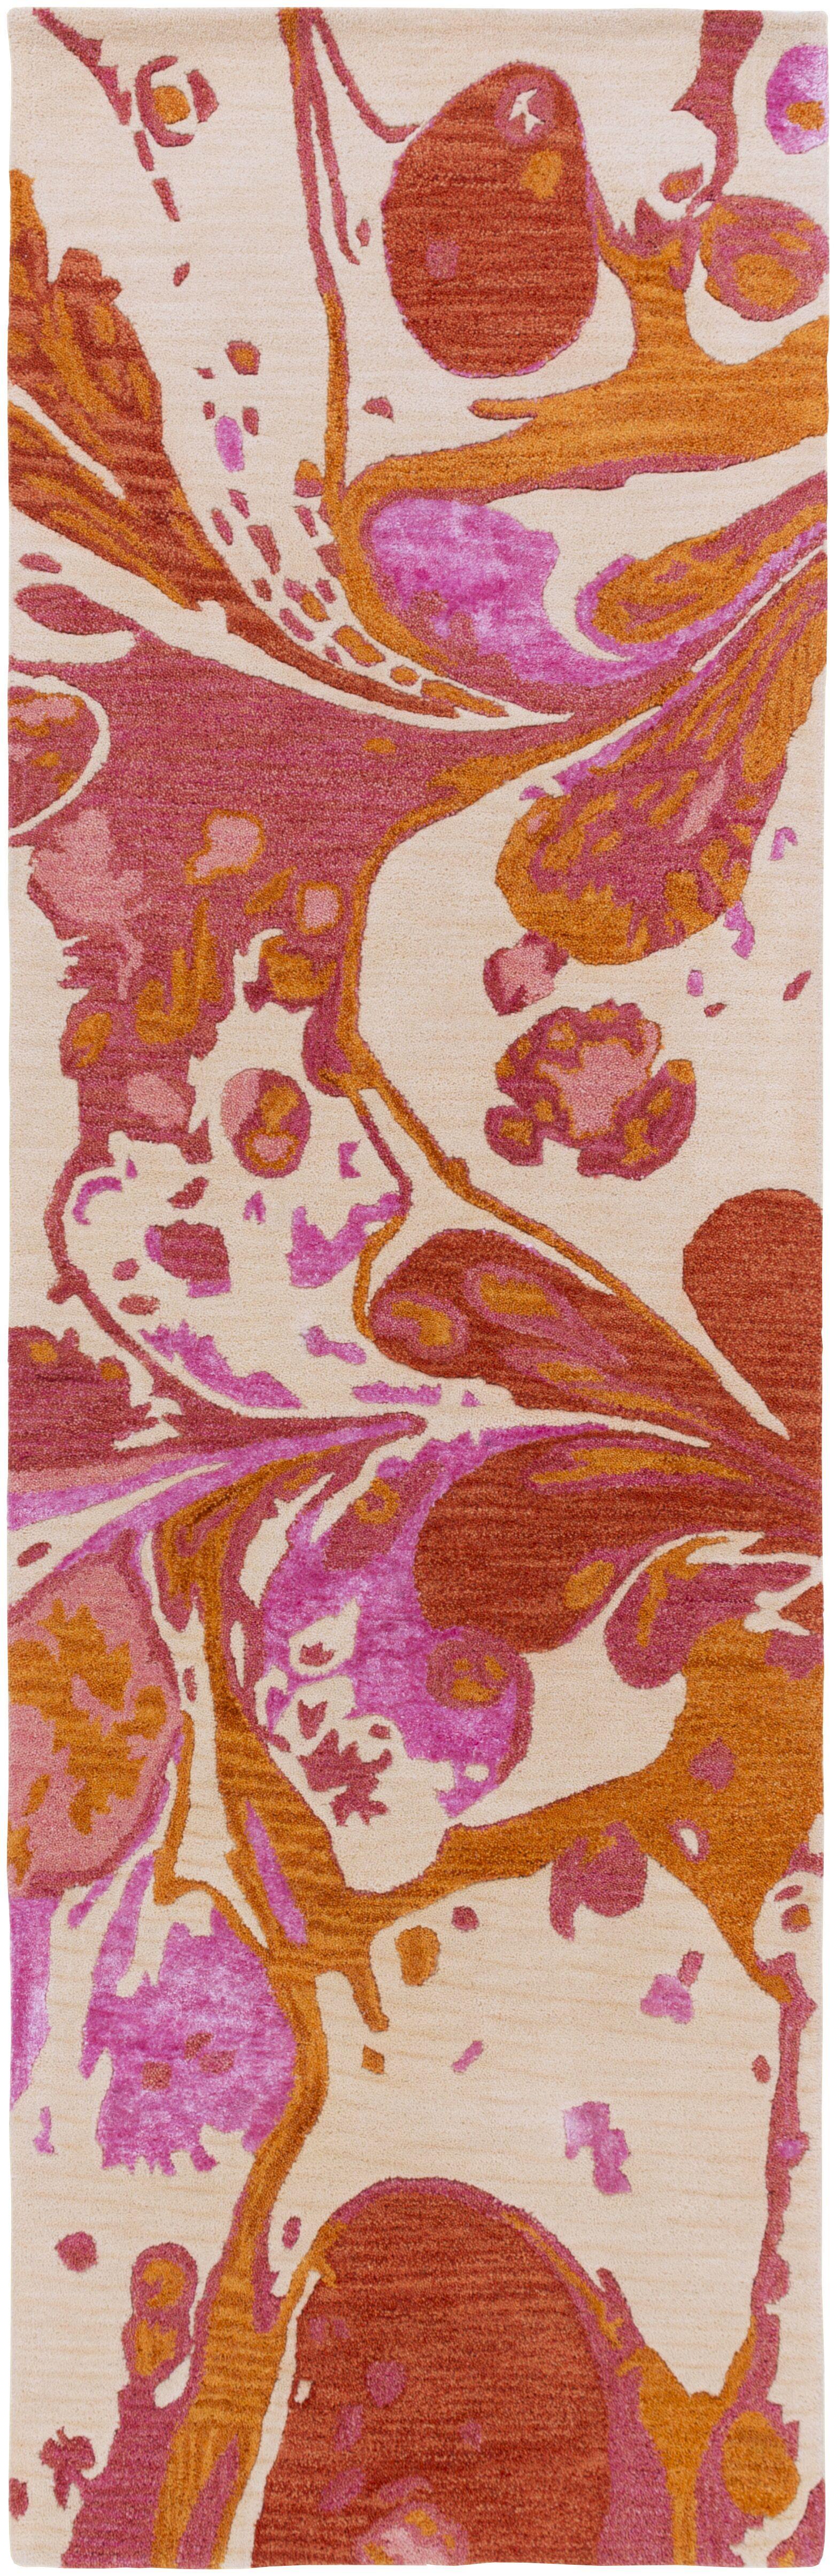 Brees Hand Tufted Wool Orange/Pink Area Rug Rug Size: Runner 2'6